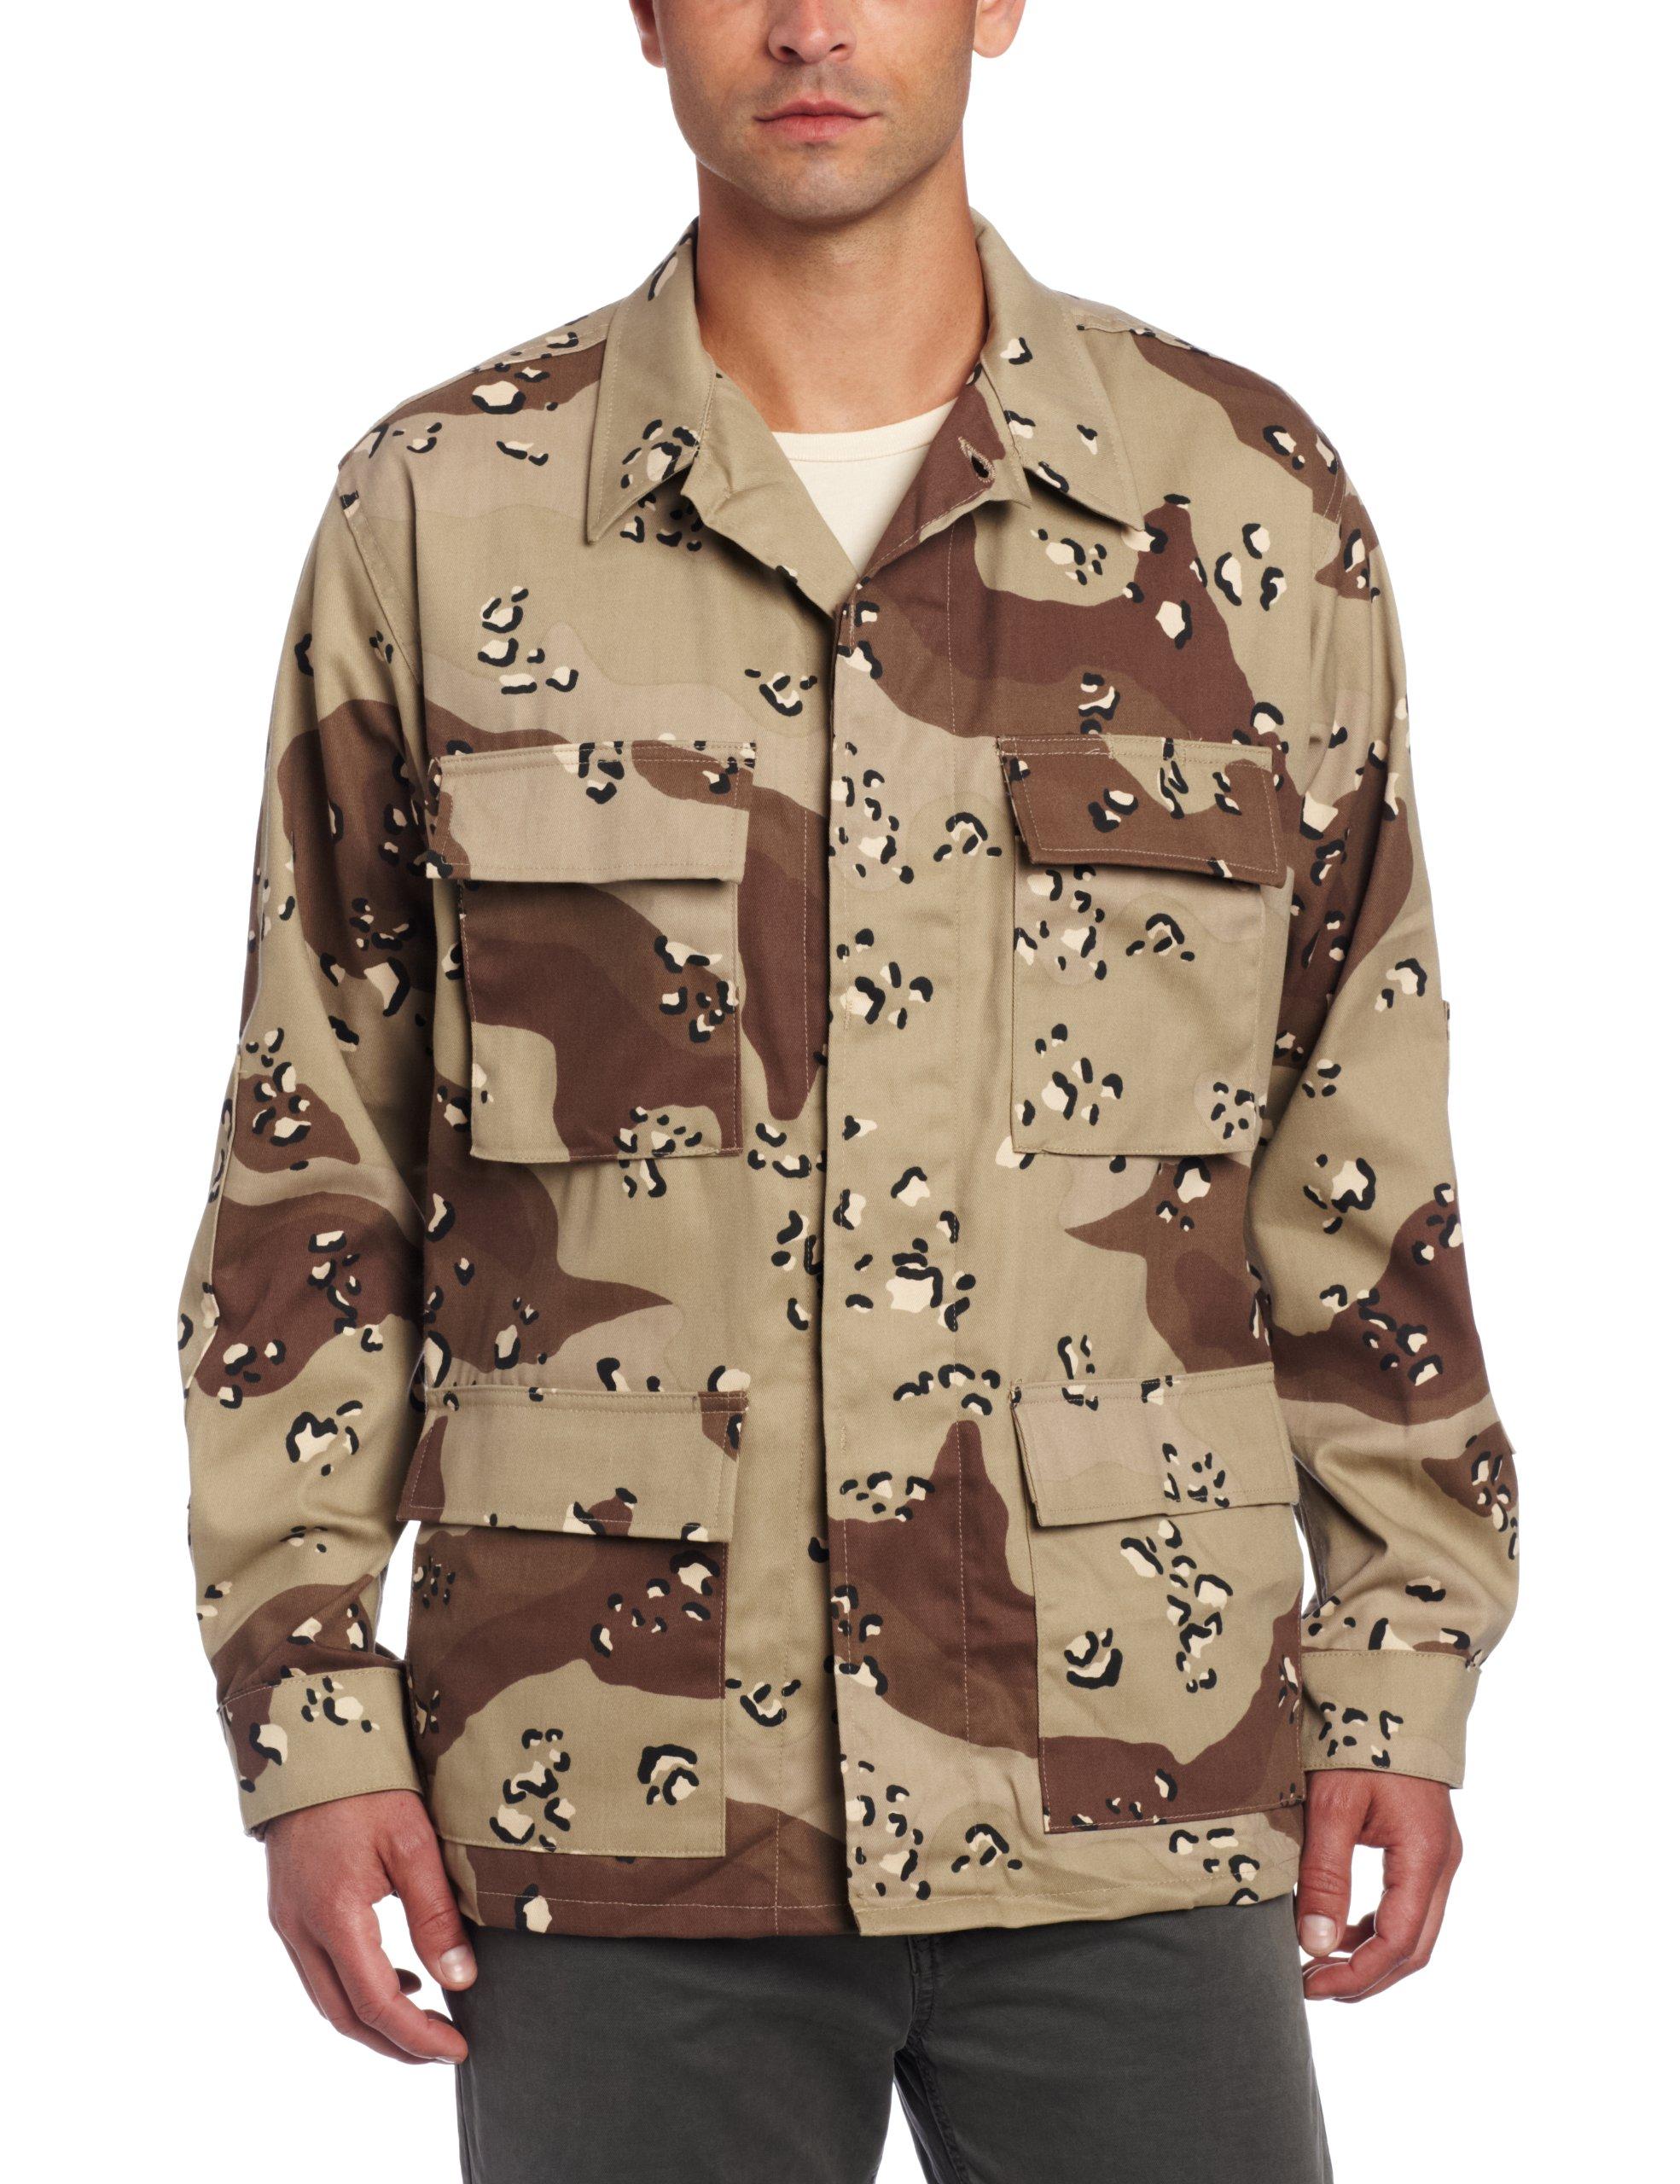 Propper Men's BDU Coat, 6 Color Desert, Small Regular